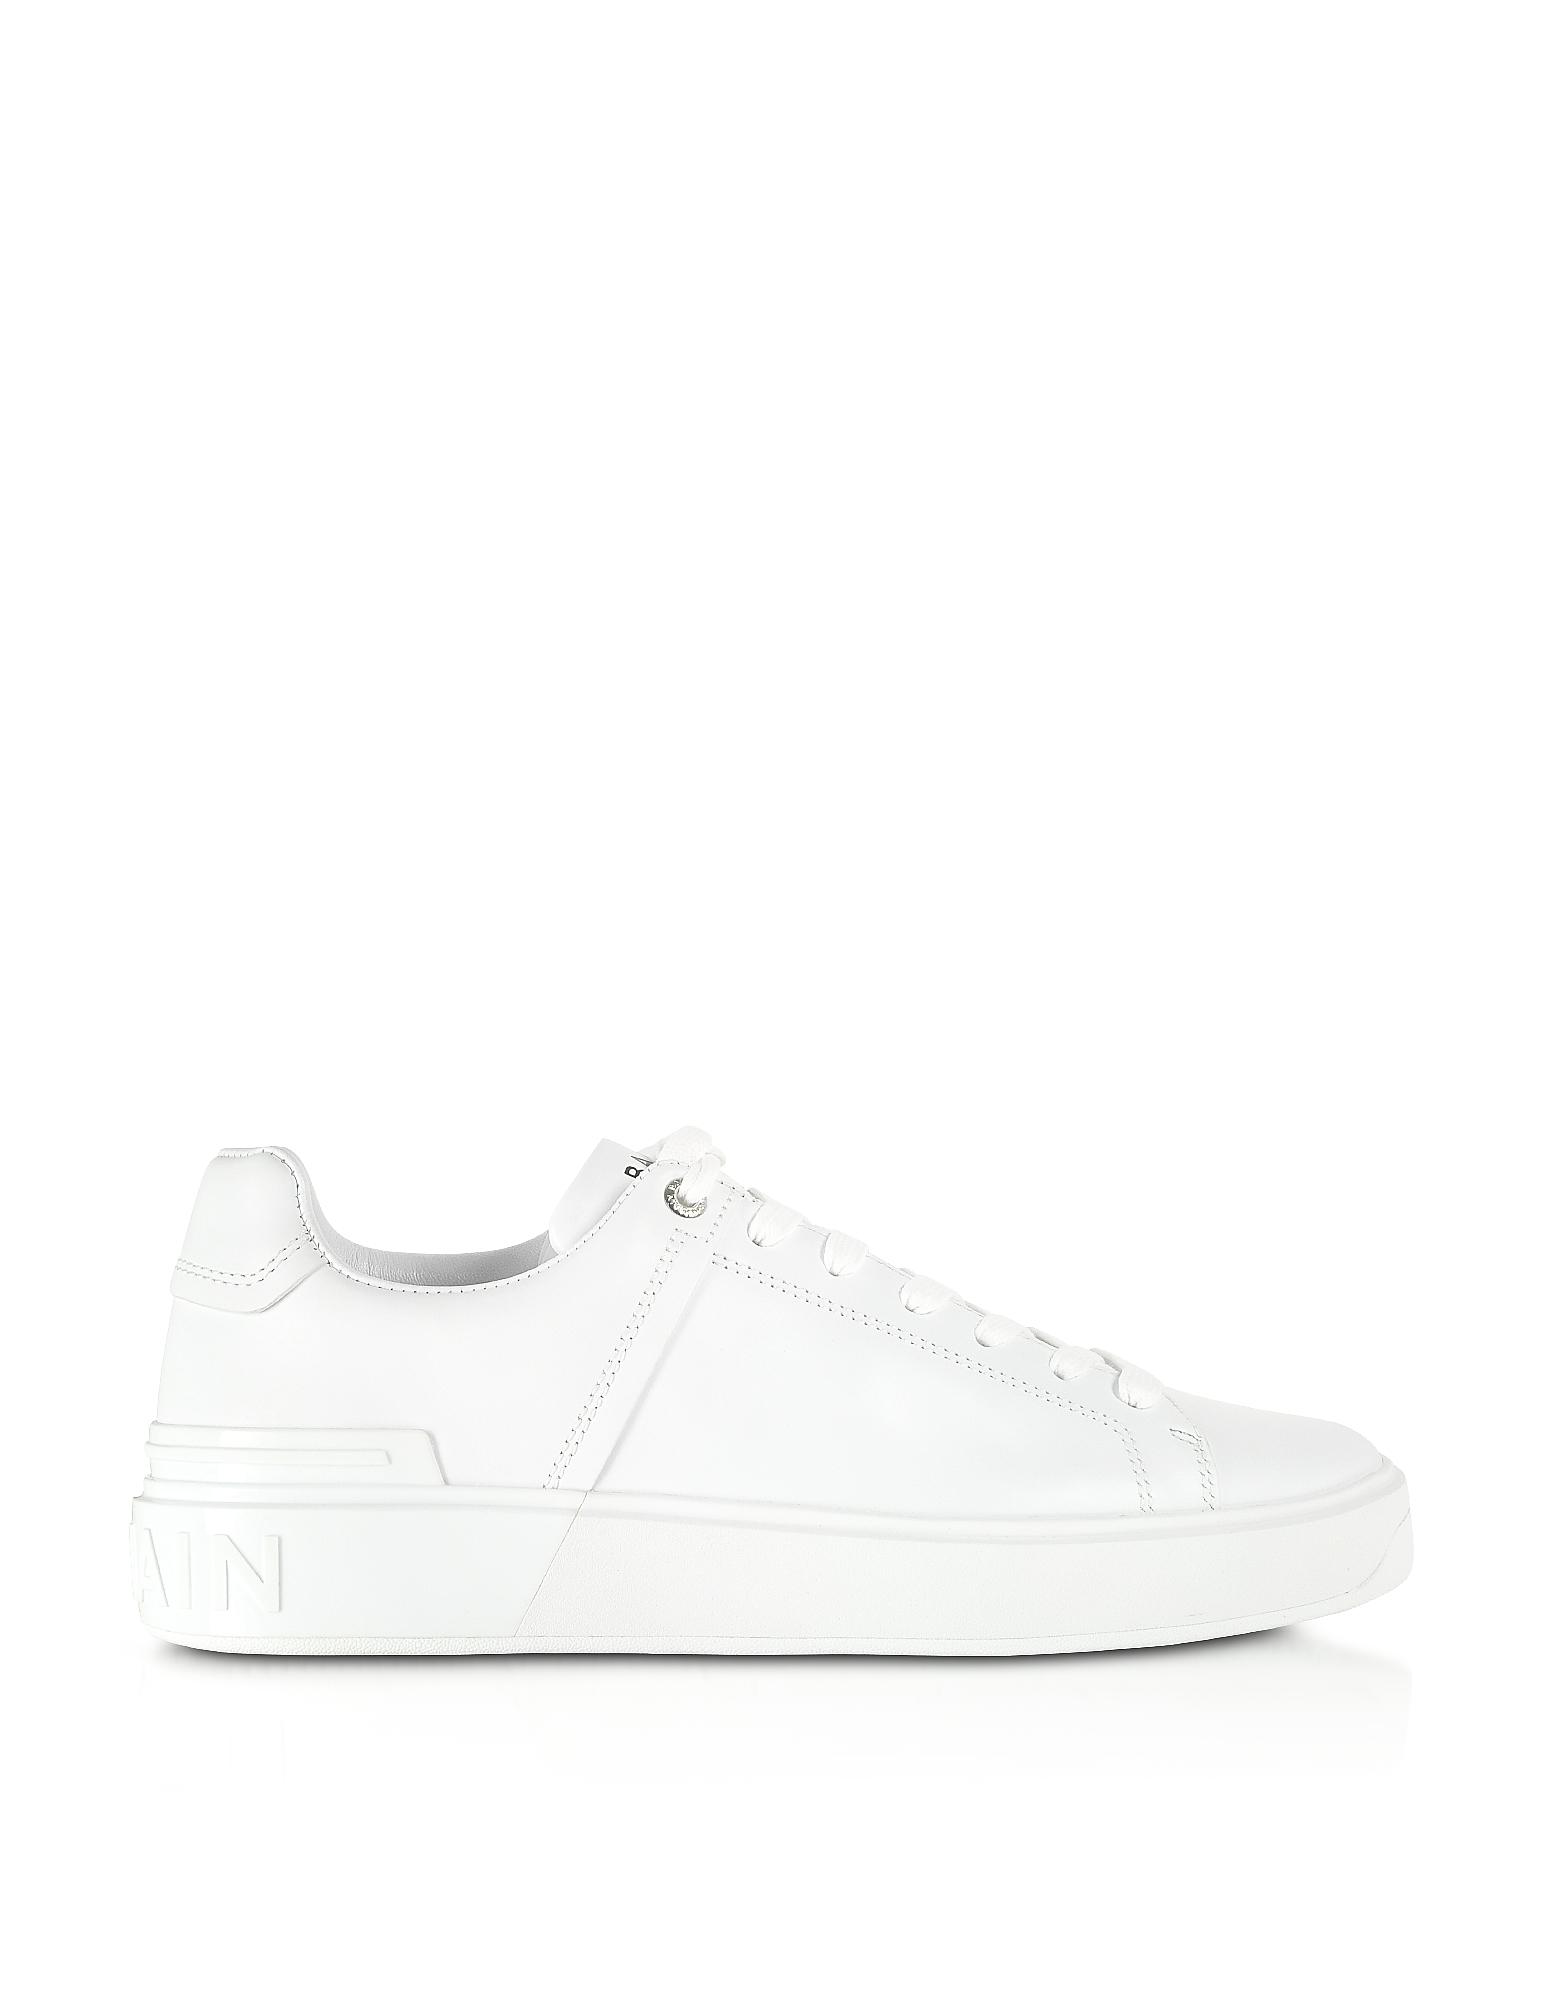 Balmain Designer Shoes, White Low Top Men's B-Court Sneakers